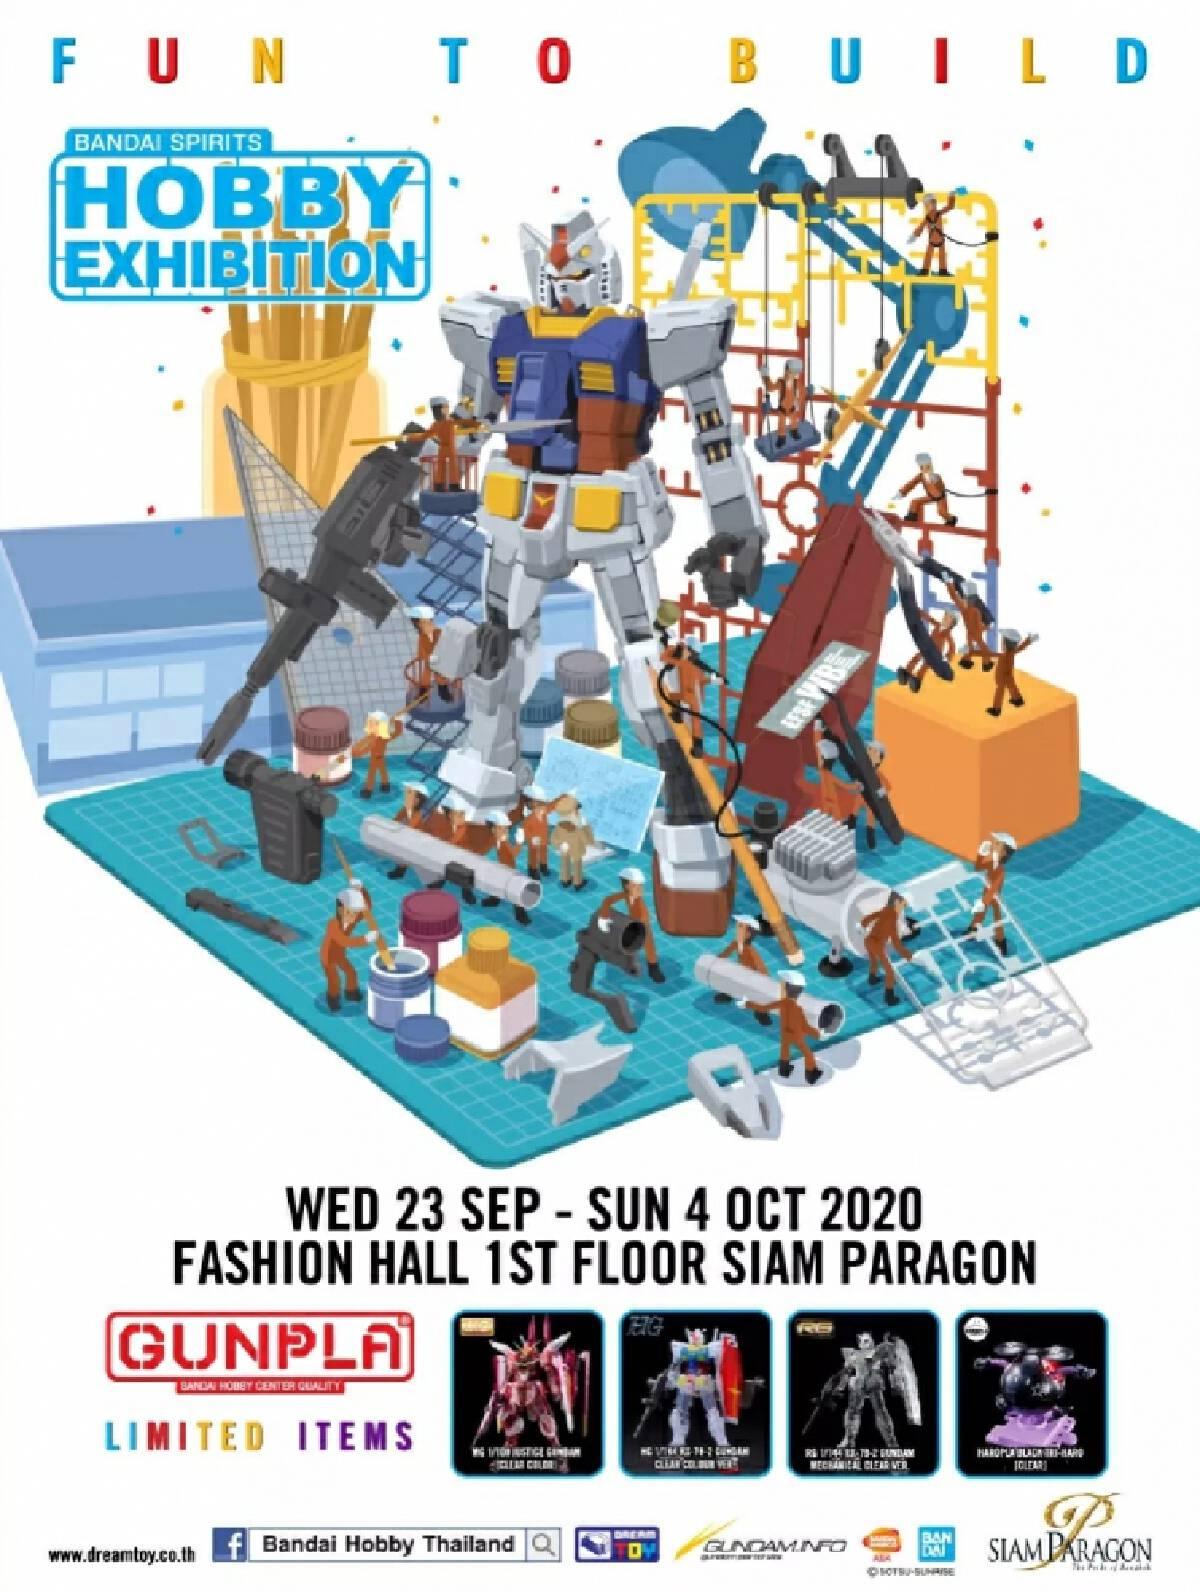 Gundam robots invade Siam Paragon next week